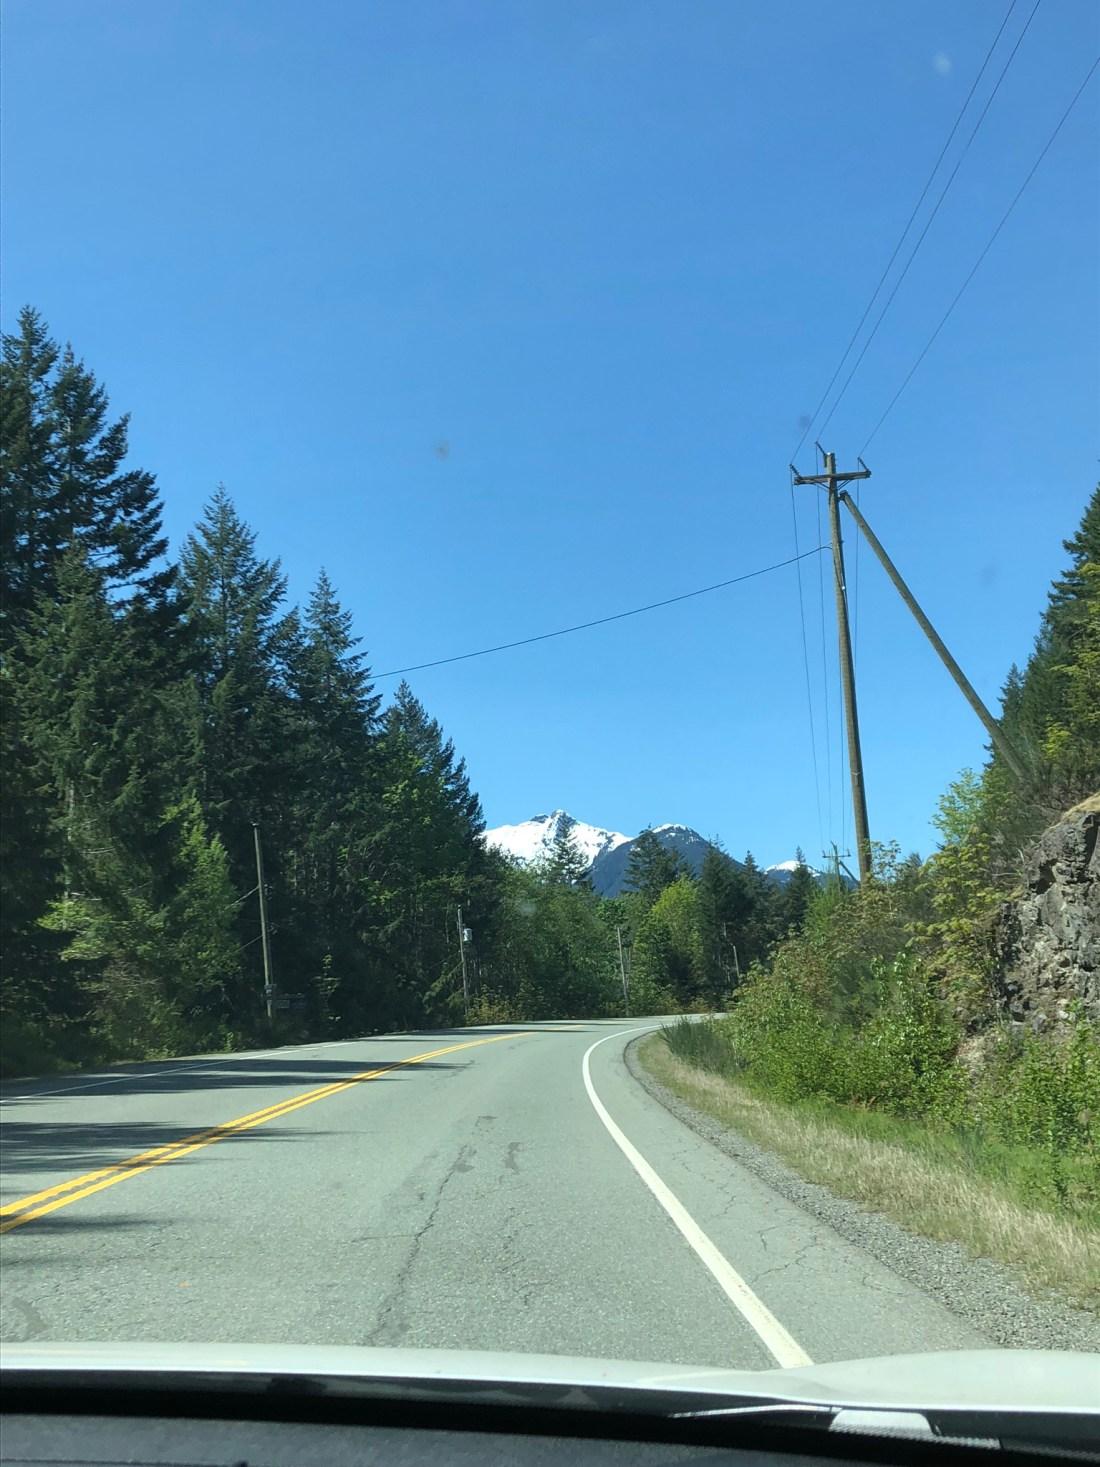 Driving to Tofino, Vancouver Island